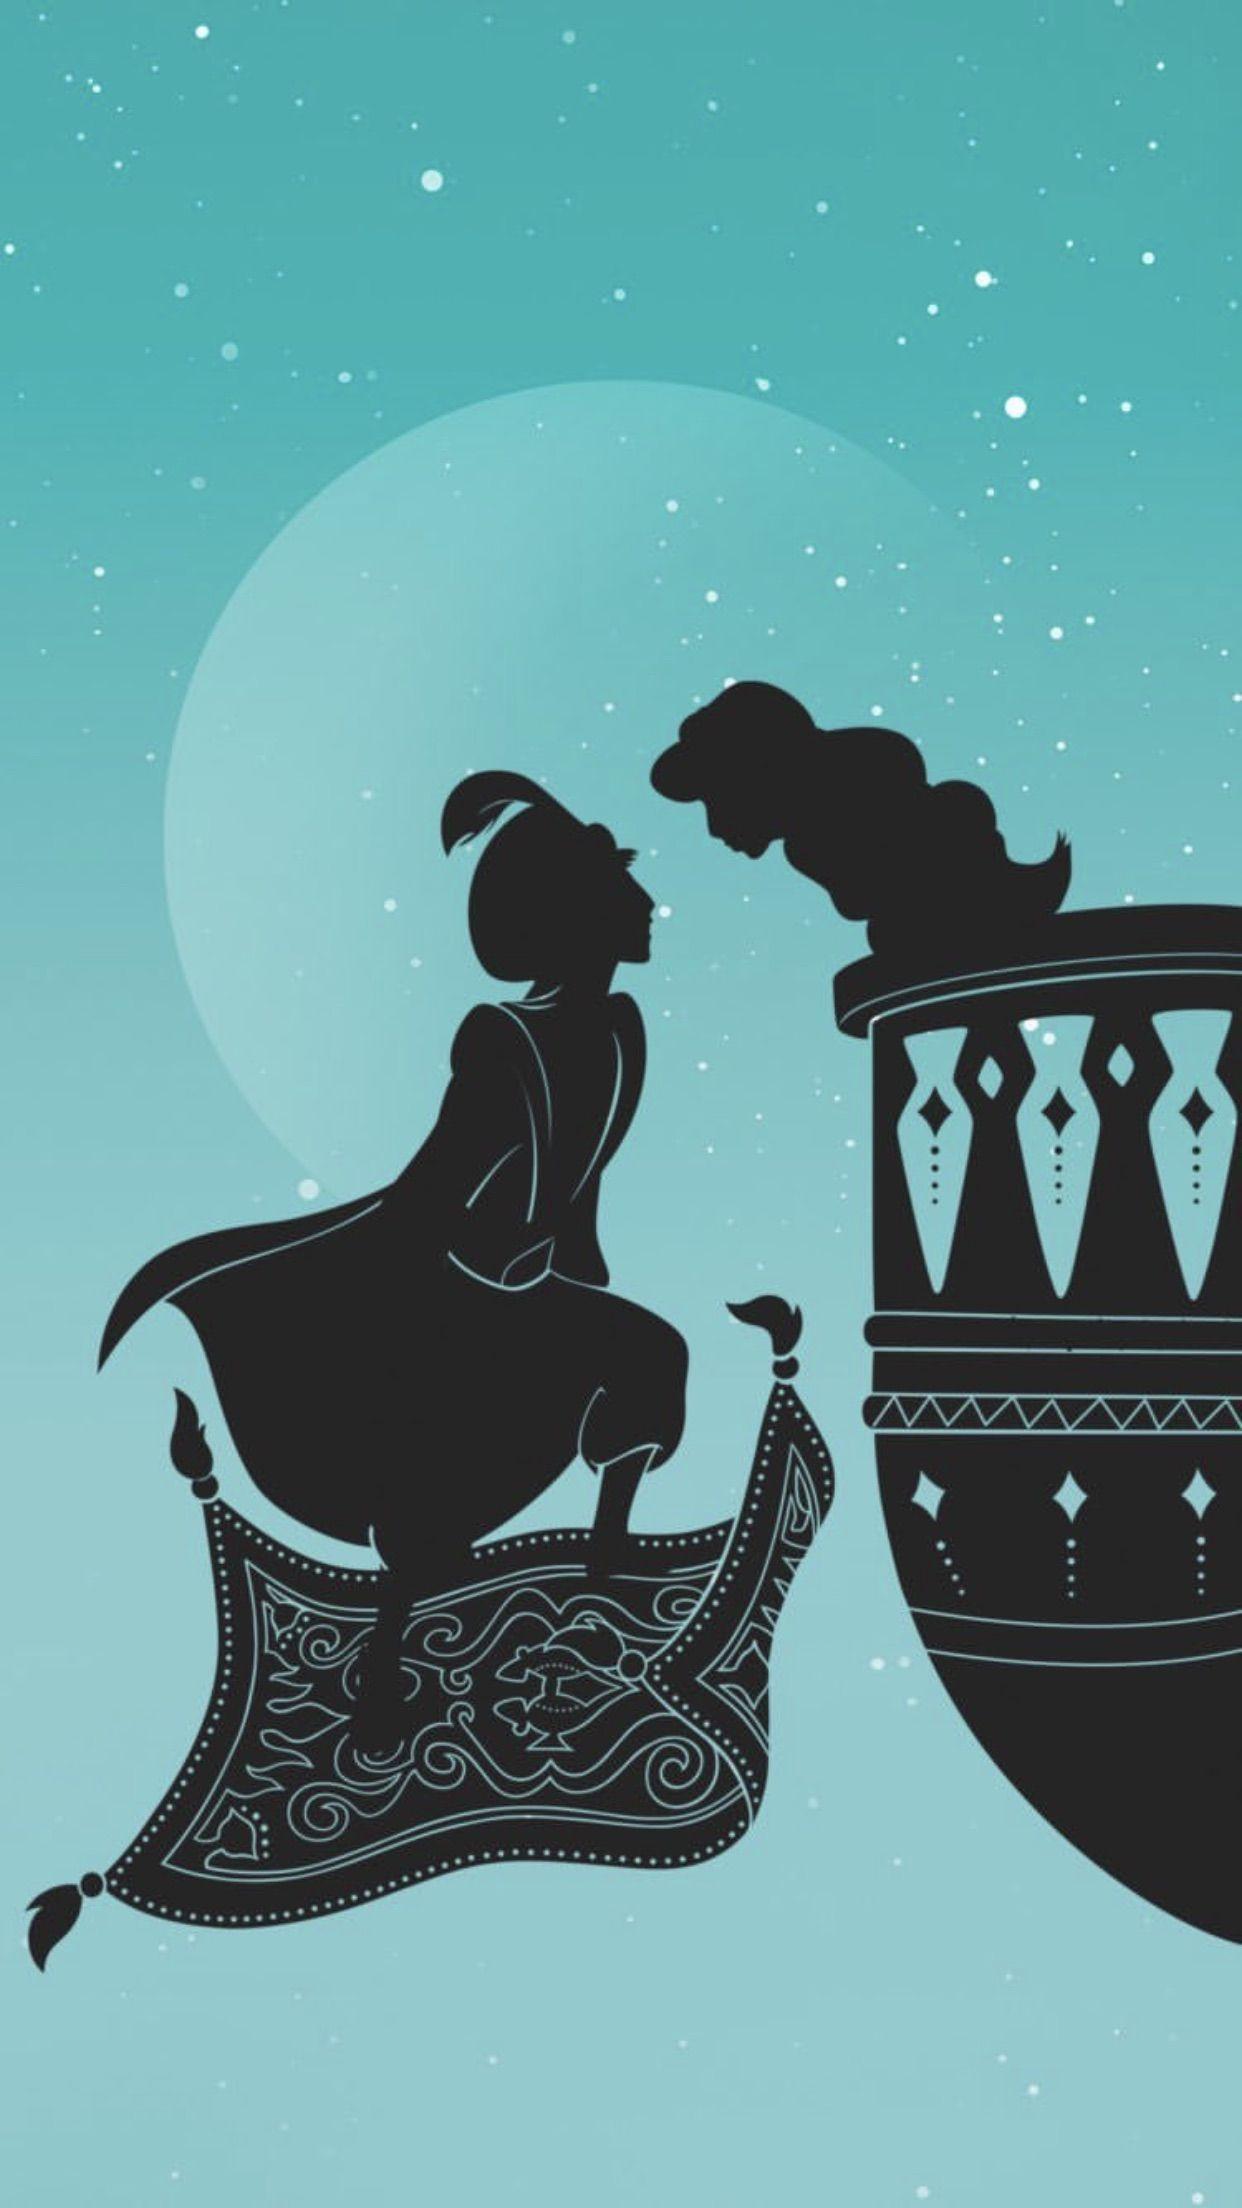 Disney おしゃれまとめの人気アイデア Pinterest Izaskun Echevarria ディズニーアート アラジン ディズニー ディズニー壁紙 プリンセス